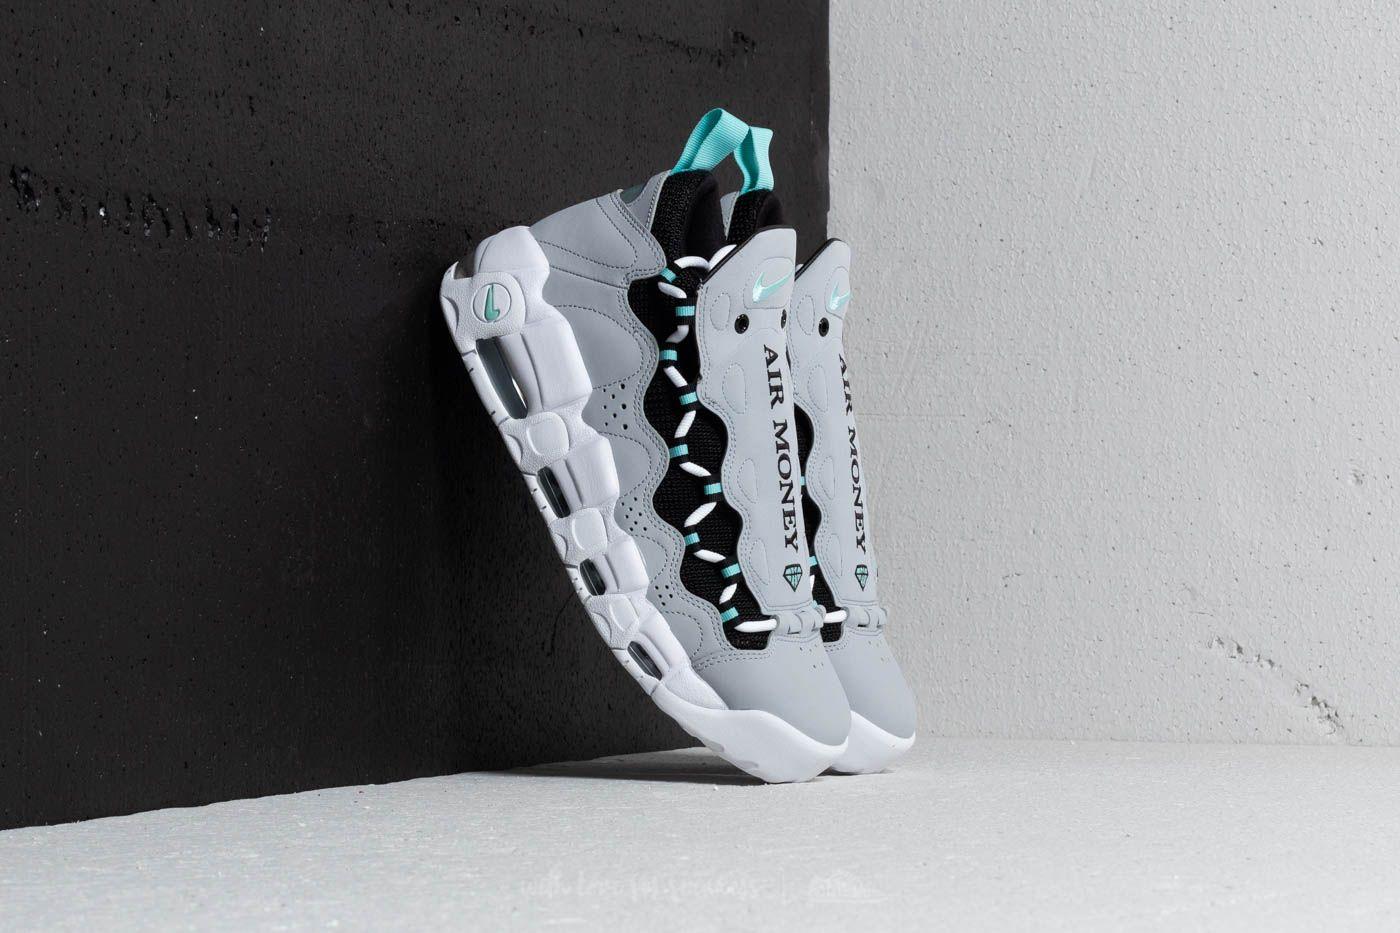 reputable site 17e0a 91700 Nike Air More Money. Wolf Grey  Island Green-Black